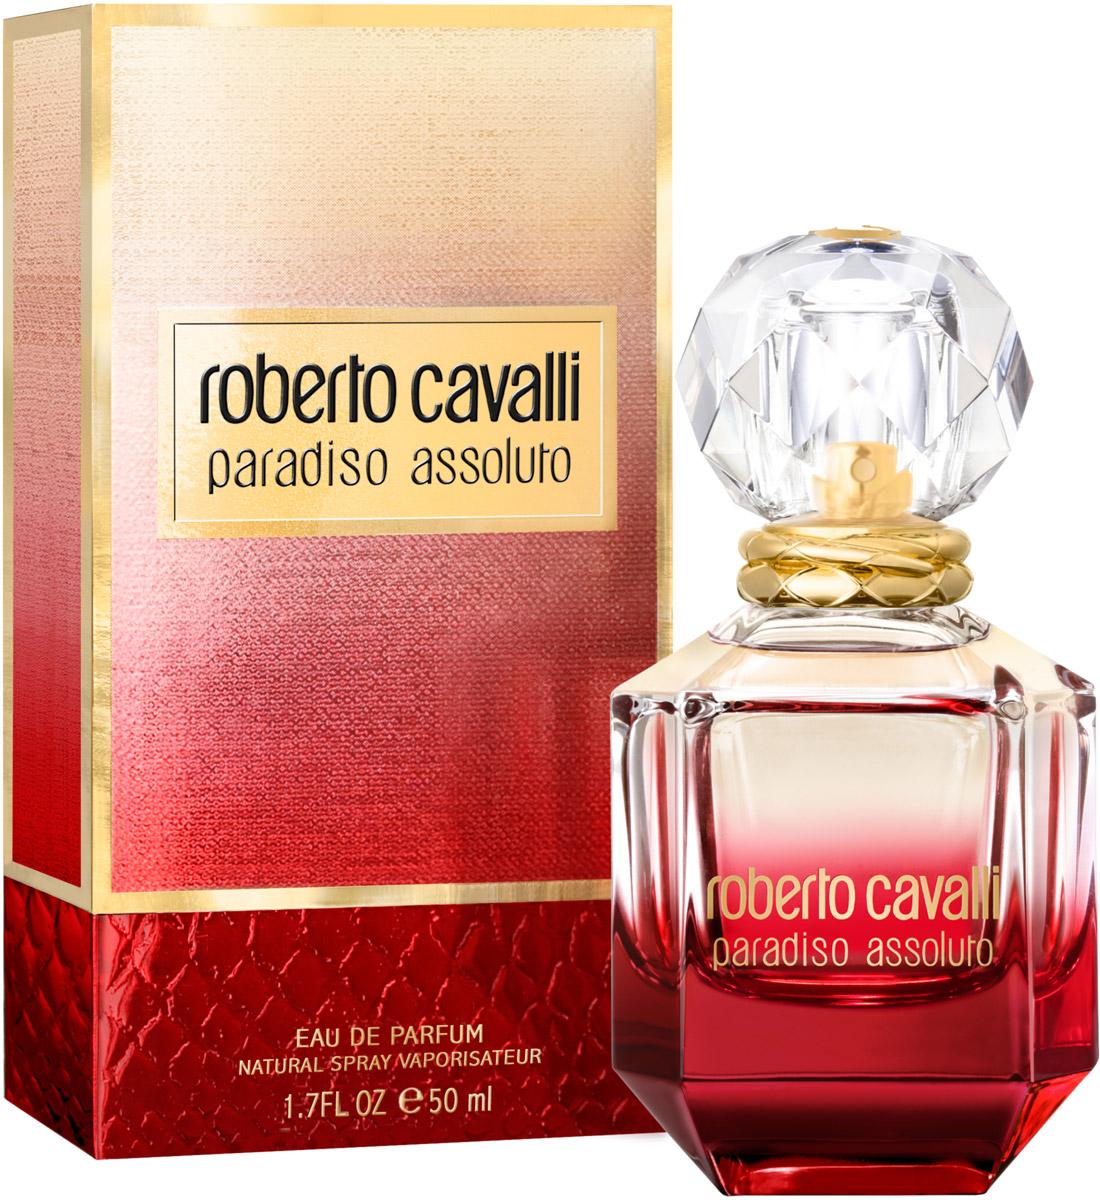 Roberto Cavalli Paradiso Assoluto женская Парфюмерная вода 50 мл